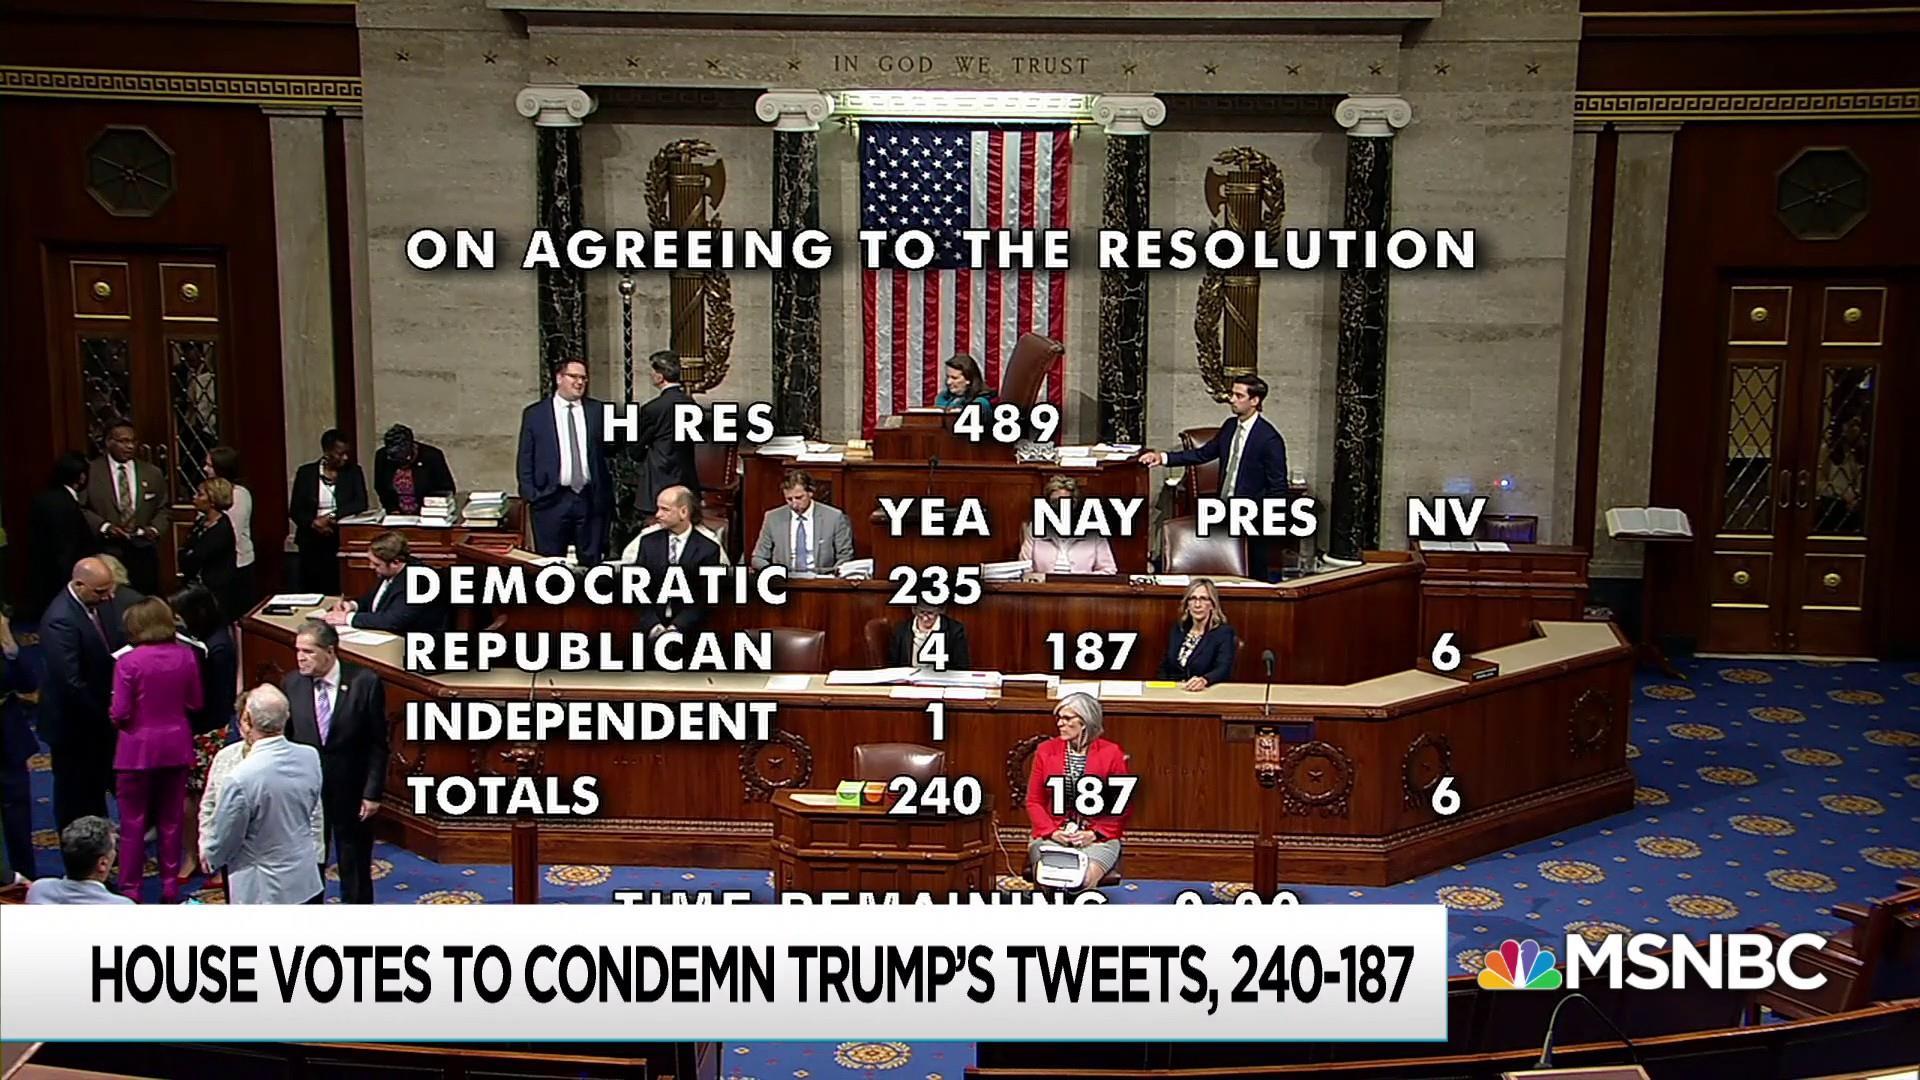 Democrats look for bipartisanship in condemnation of Trump racism